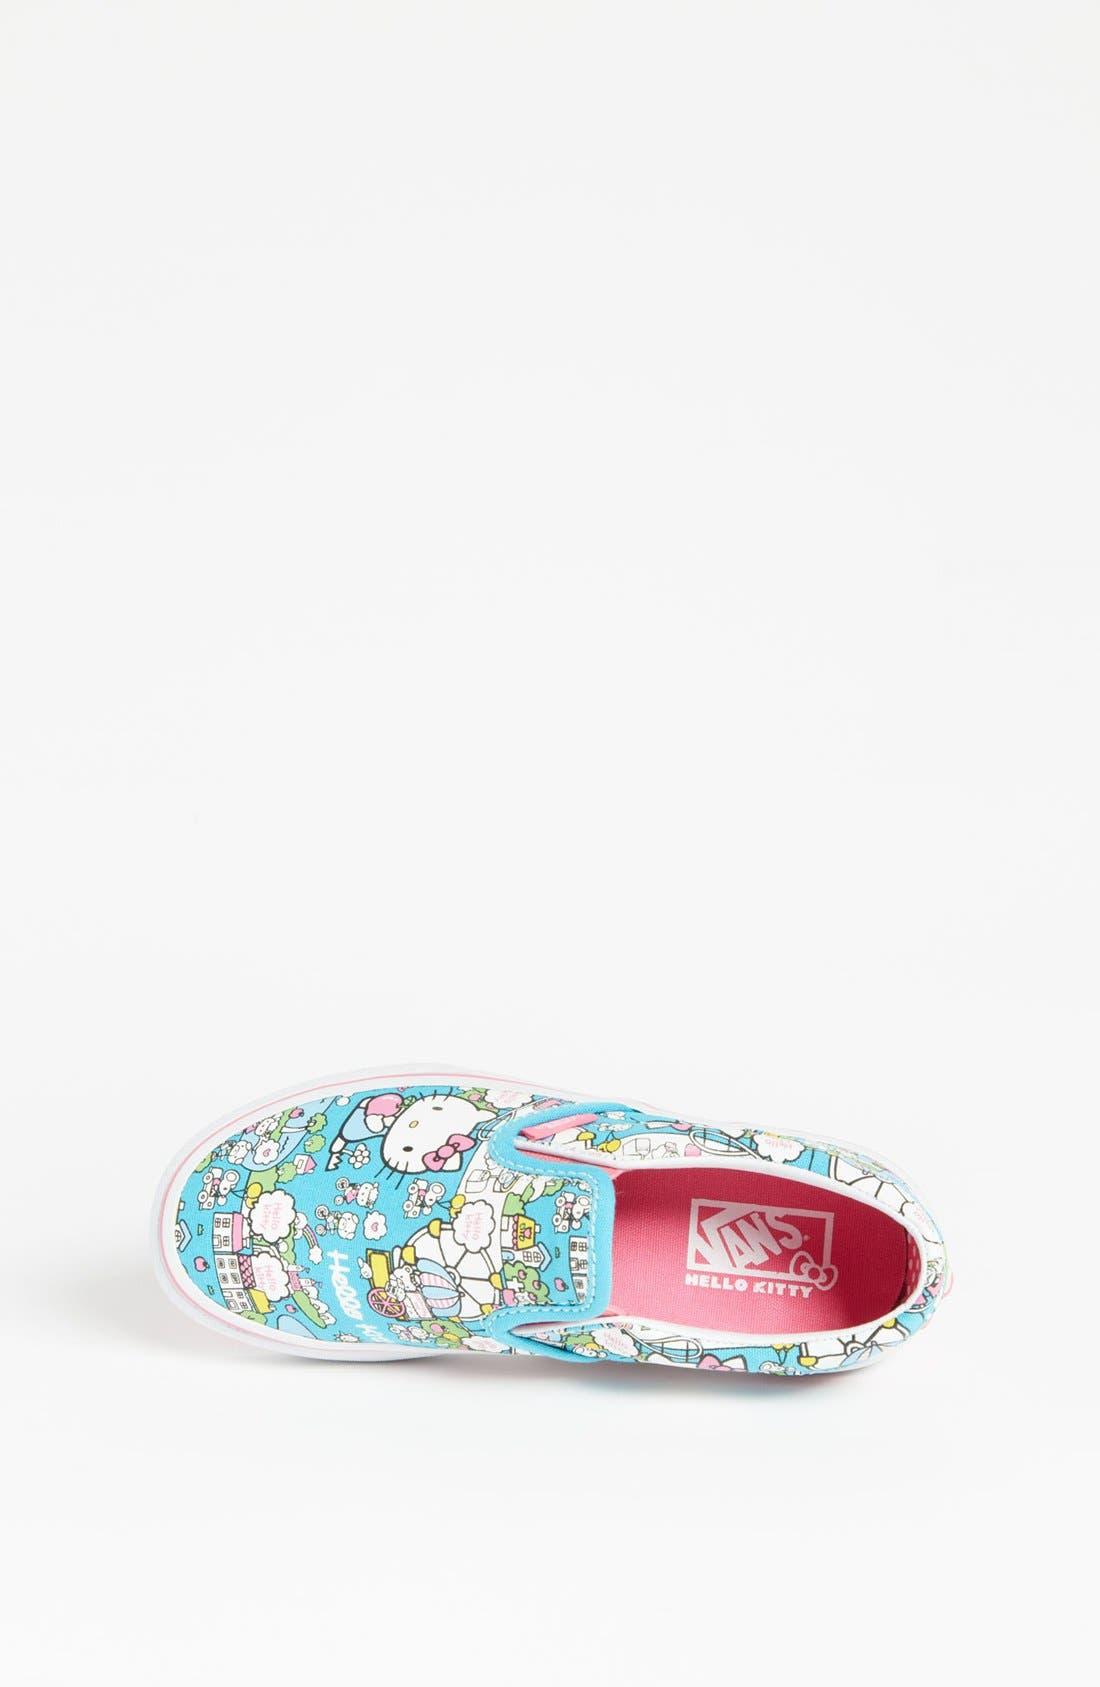 Alternate Image 3  - Vans 'Hello Kitty®' Classic Slip-On (Toddler, Little Kid & Big Kid)